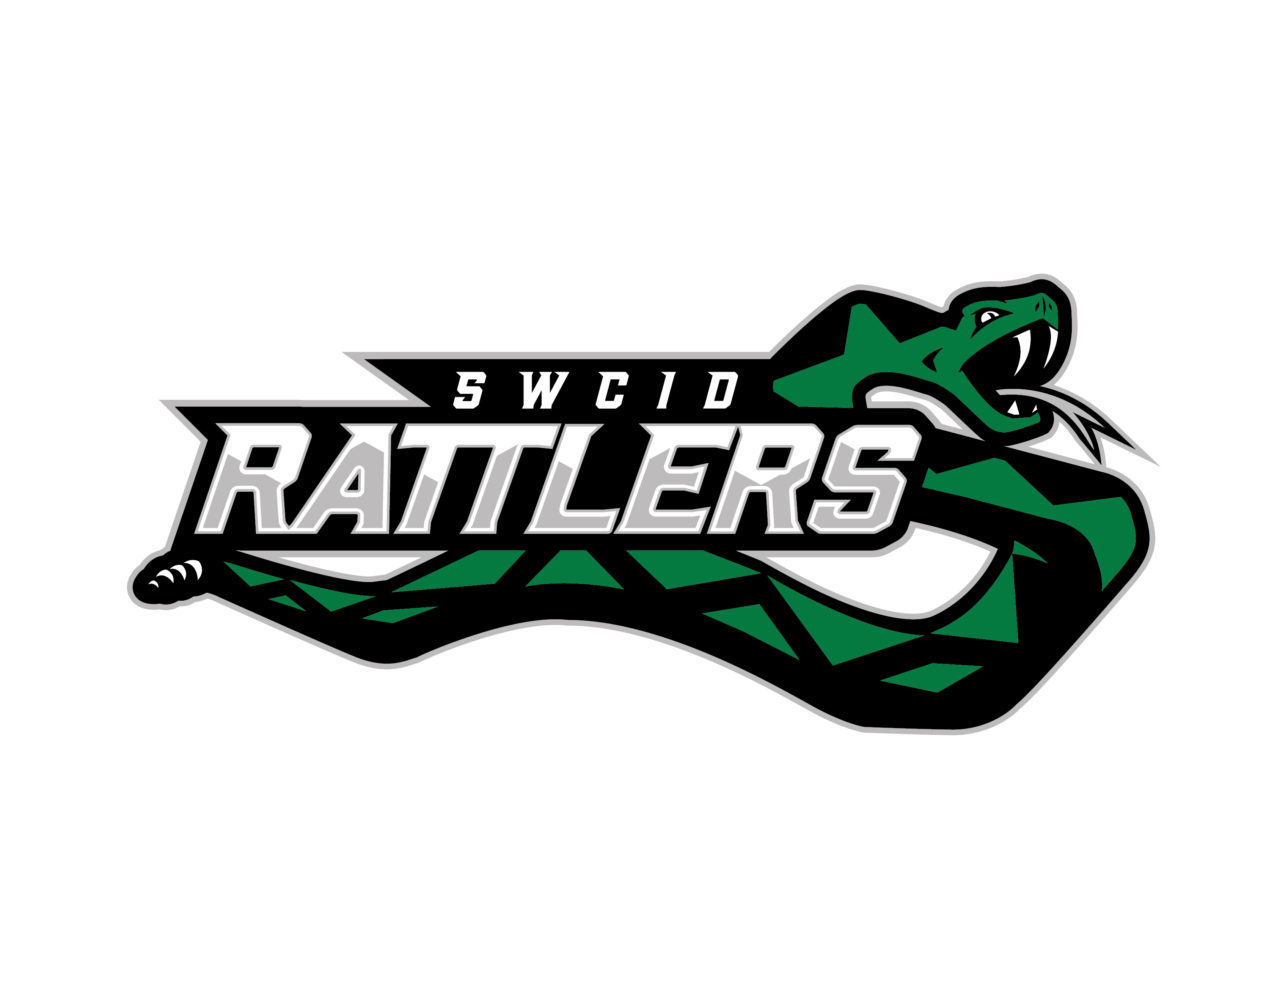 SWCID Rattlers logo